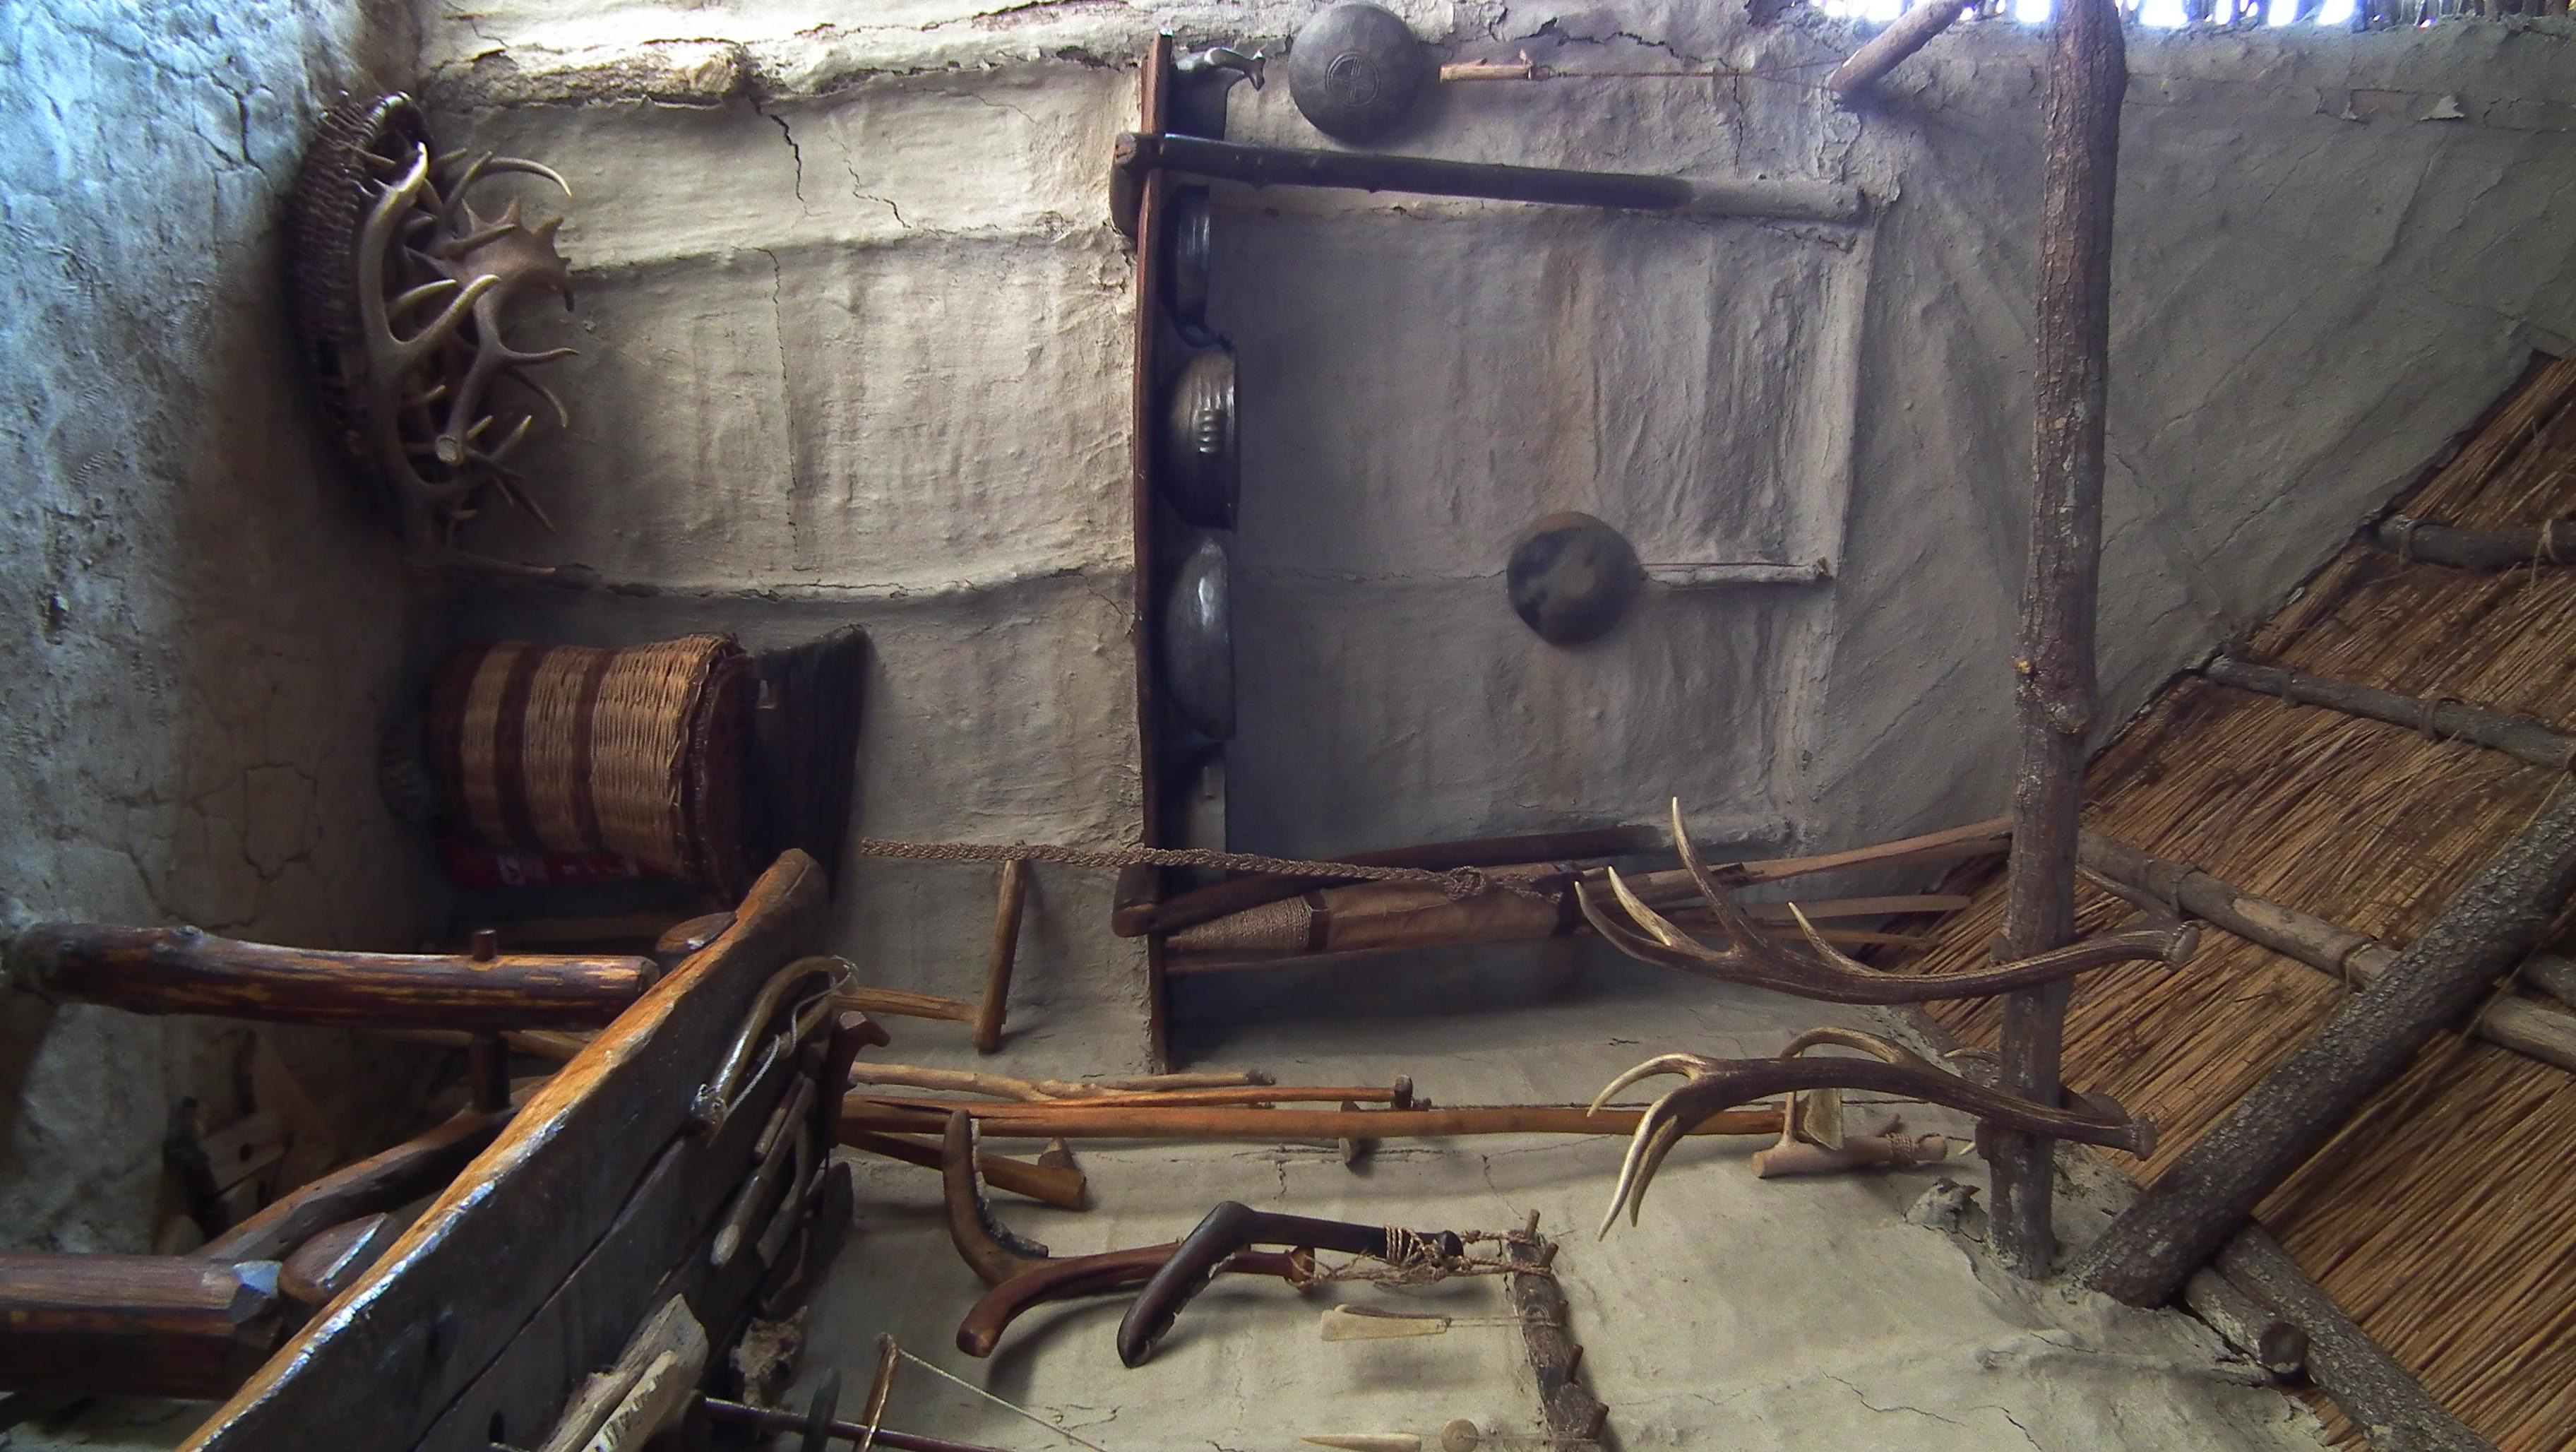 bag bellows ancient tools and craft